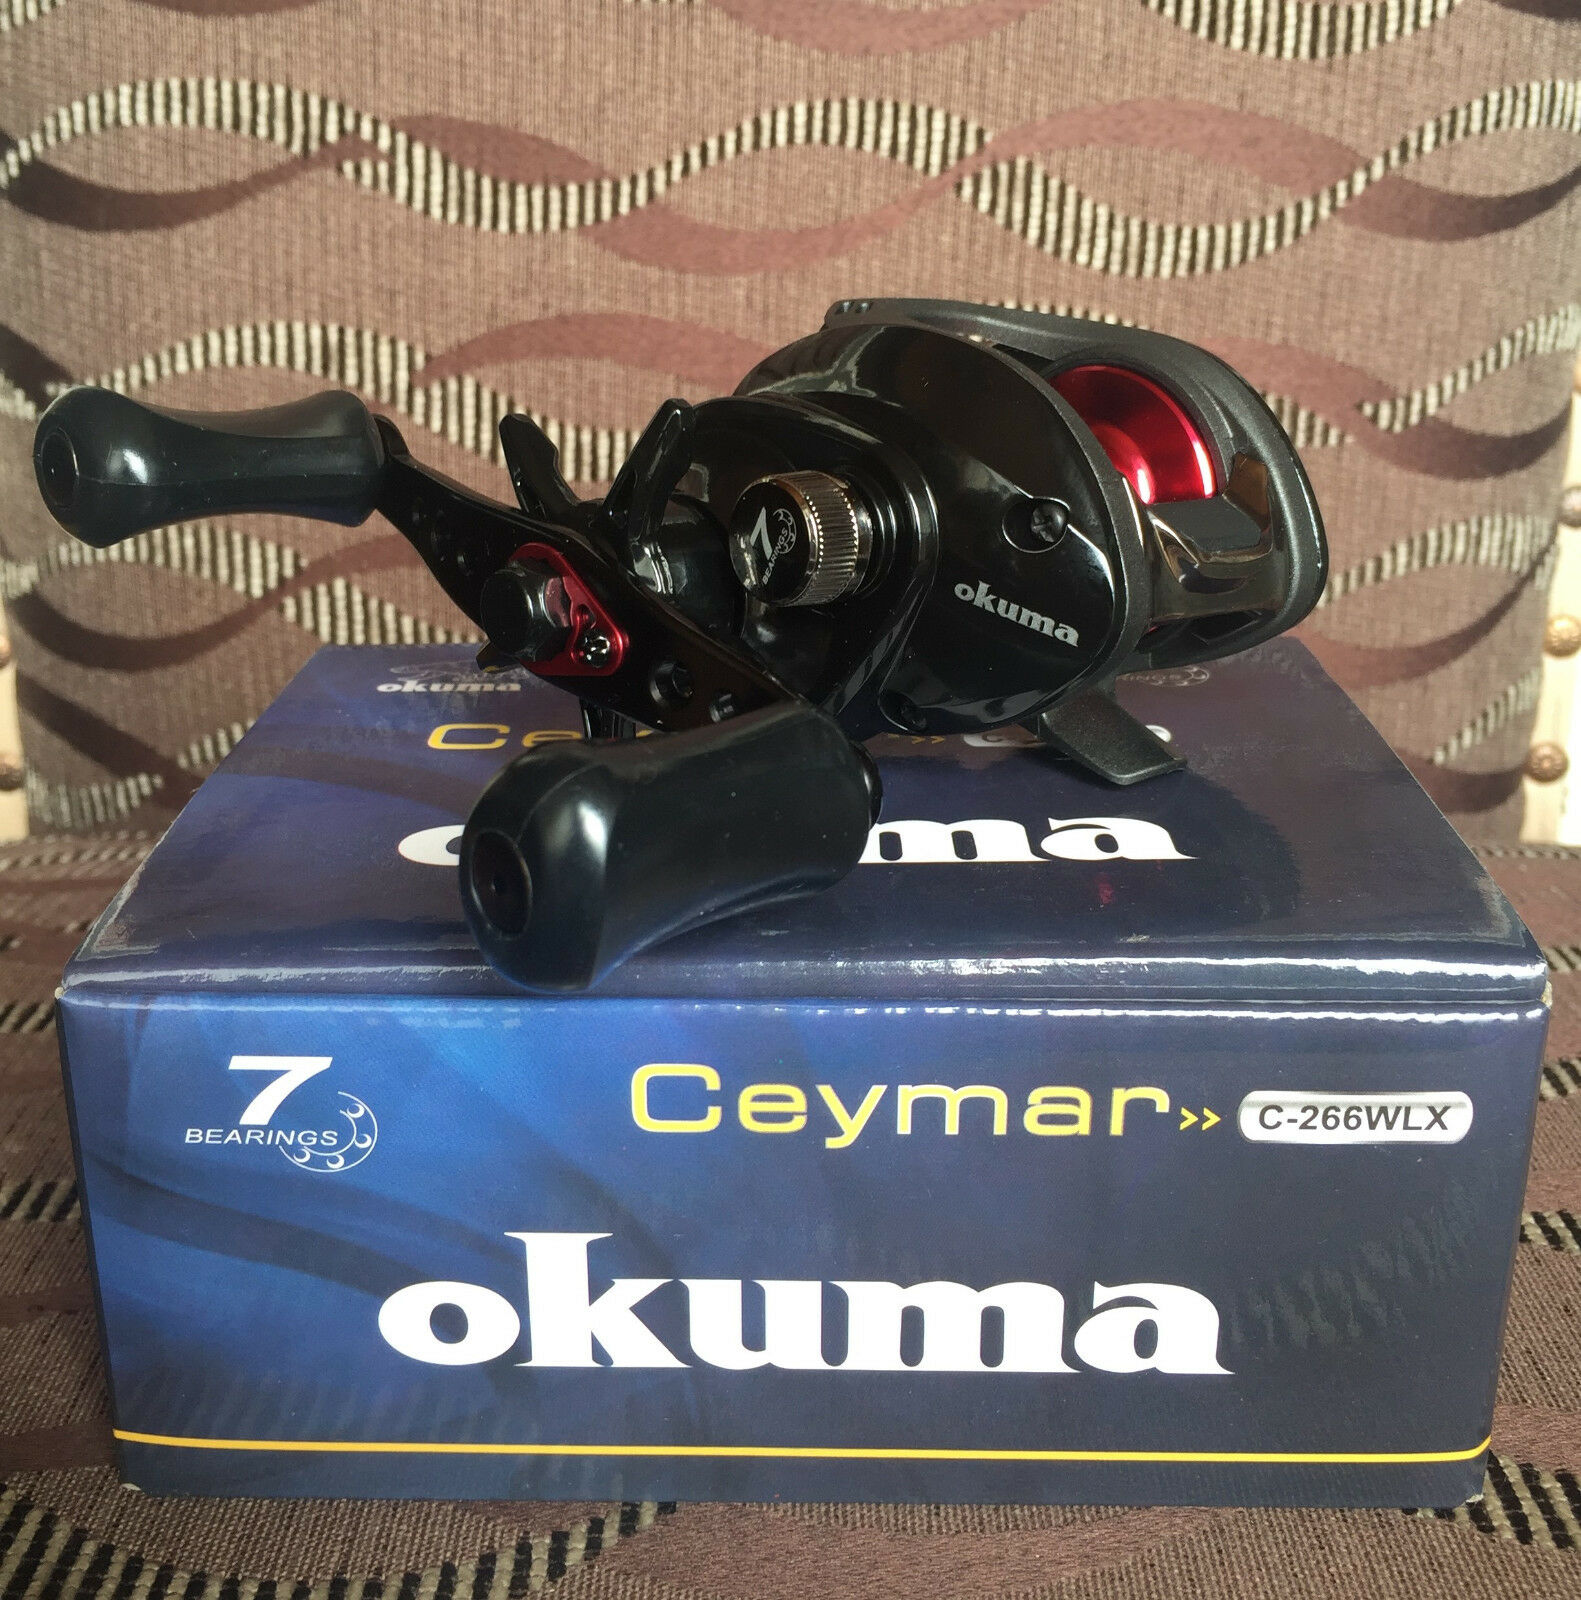 Okuma Ceymar C-266WLX C-266WLX C-266WLX Linkshand Baitcaster Multirolle 3a0813